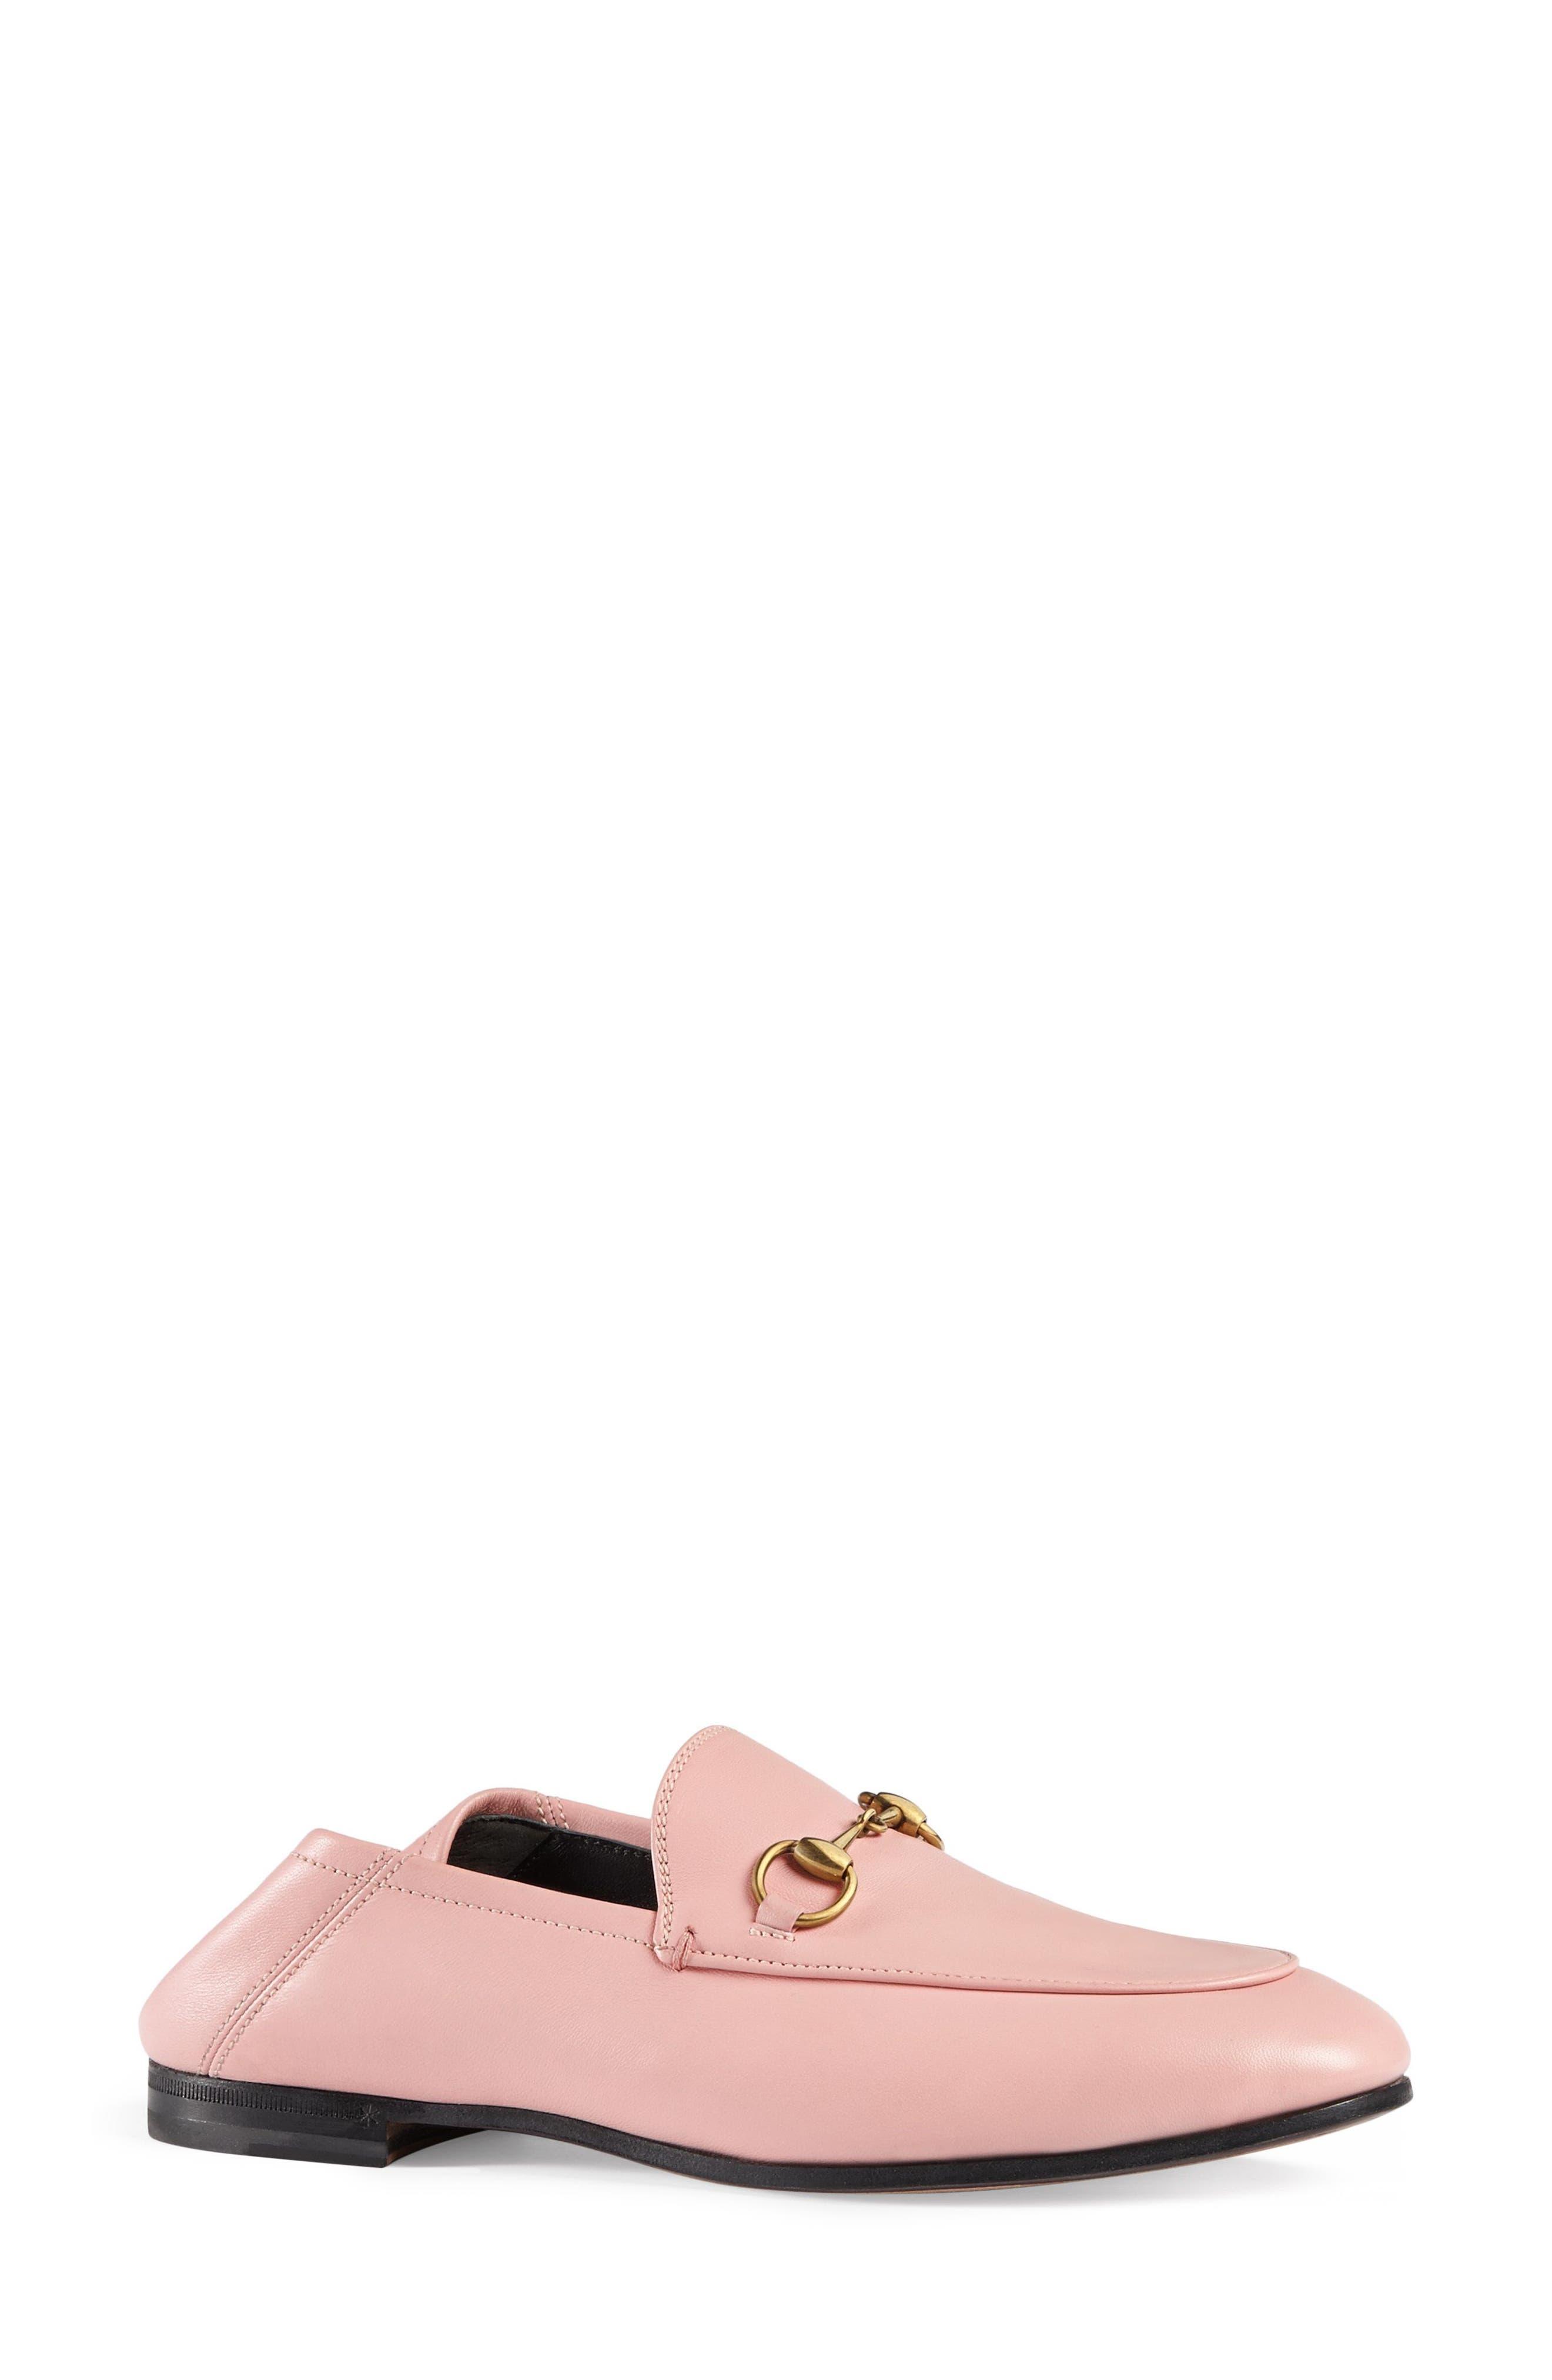 Main Image - Gucci Brixton Convertible Loafer (Women)